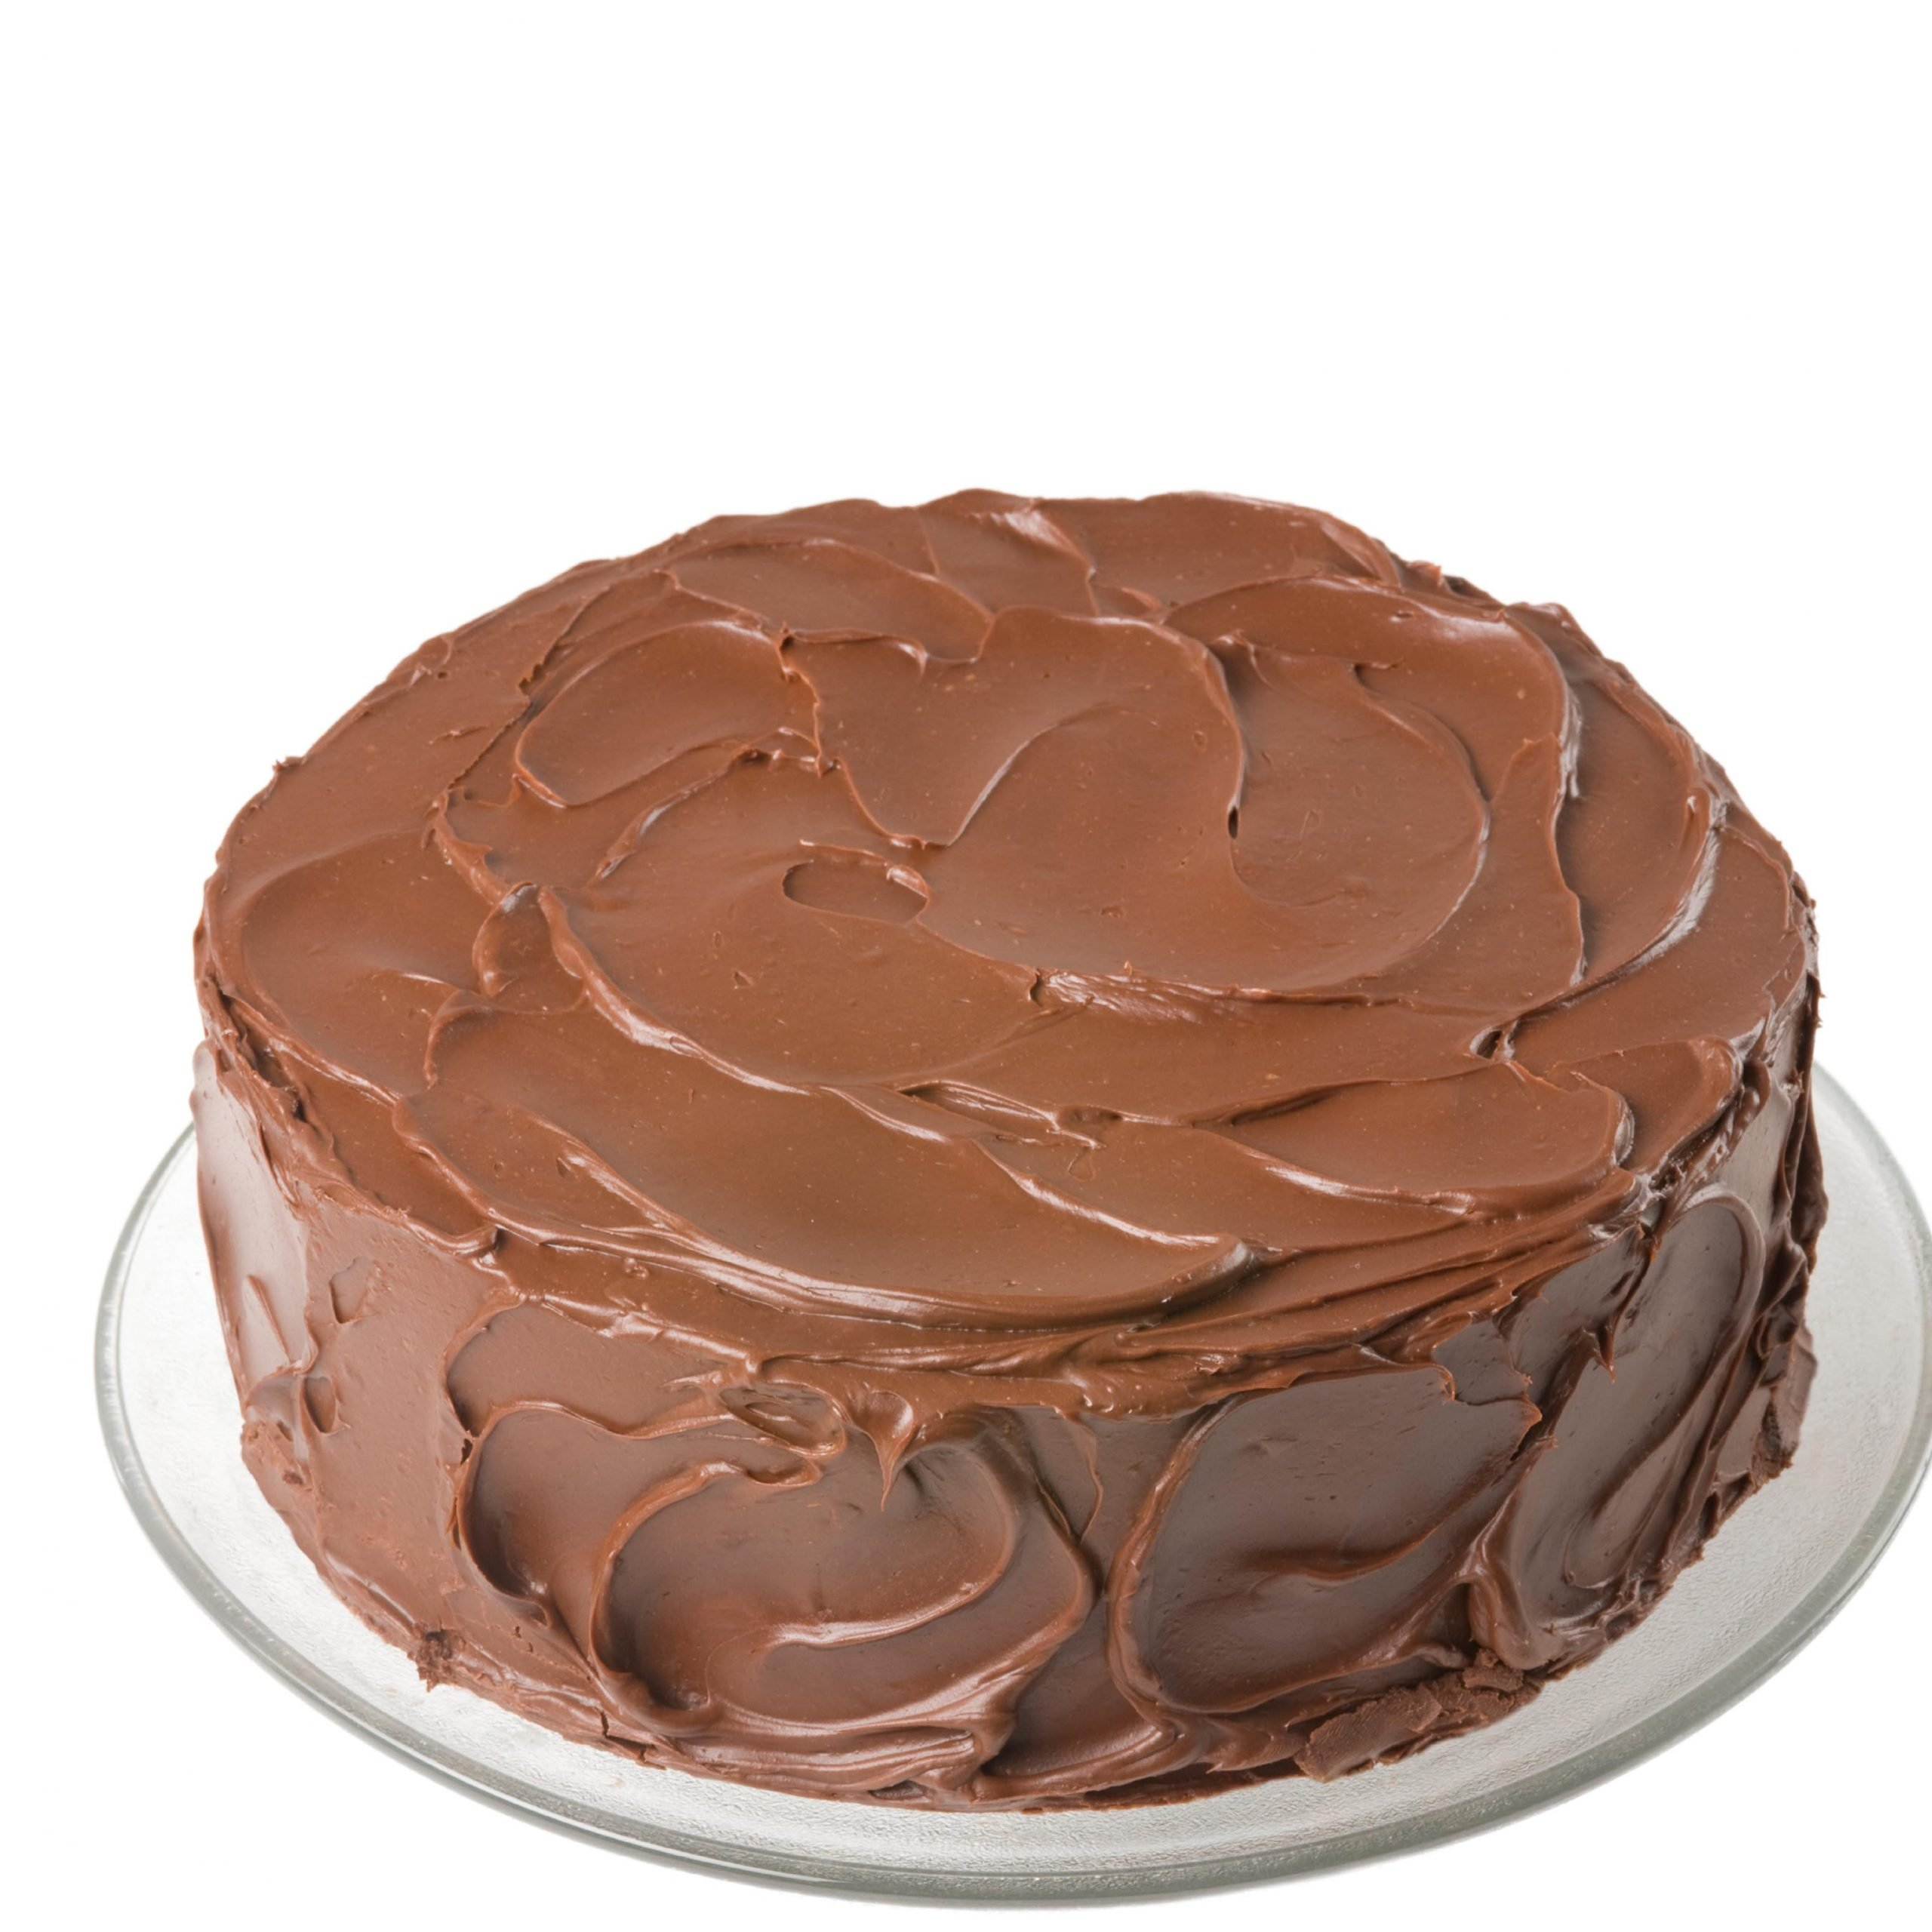 Kiki's Plated Chocolate Cake 3